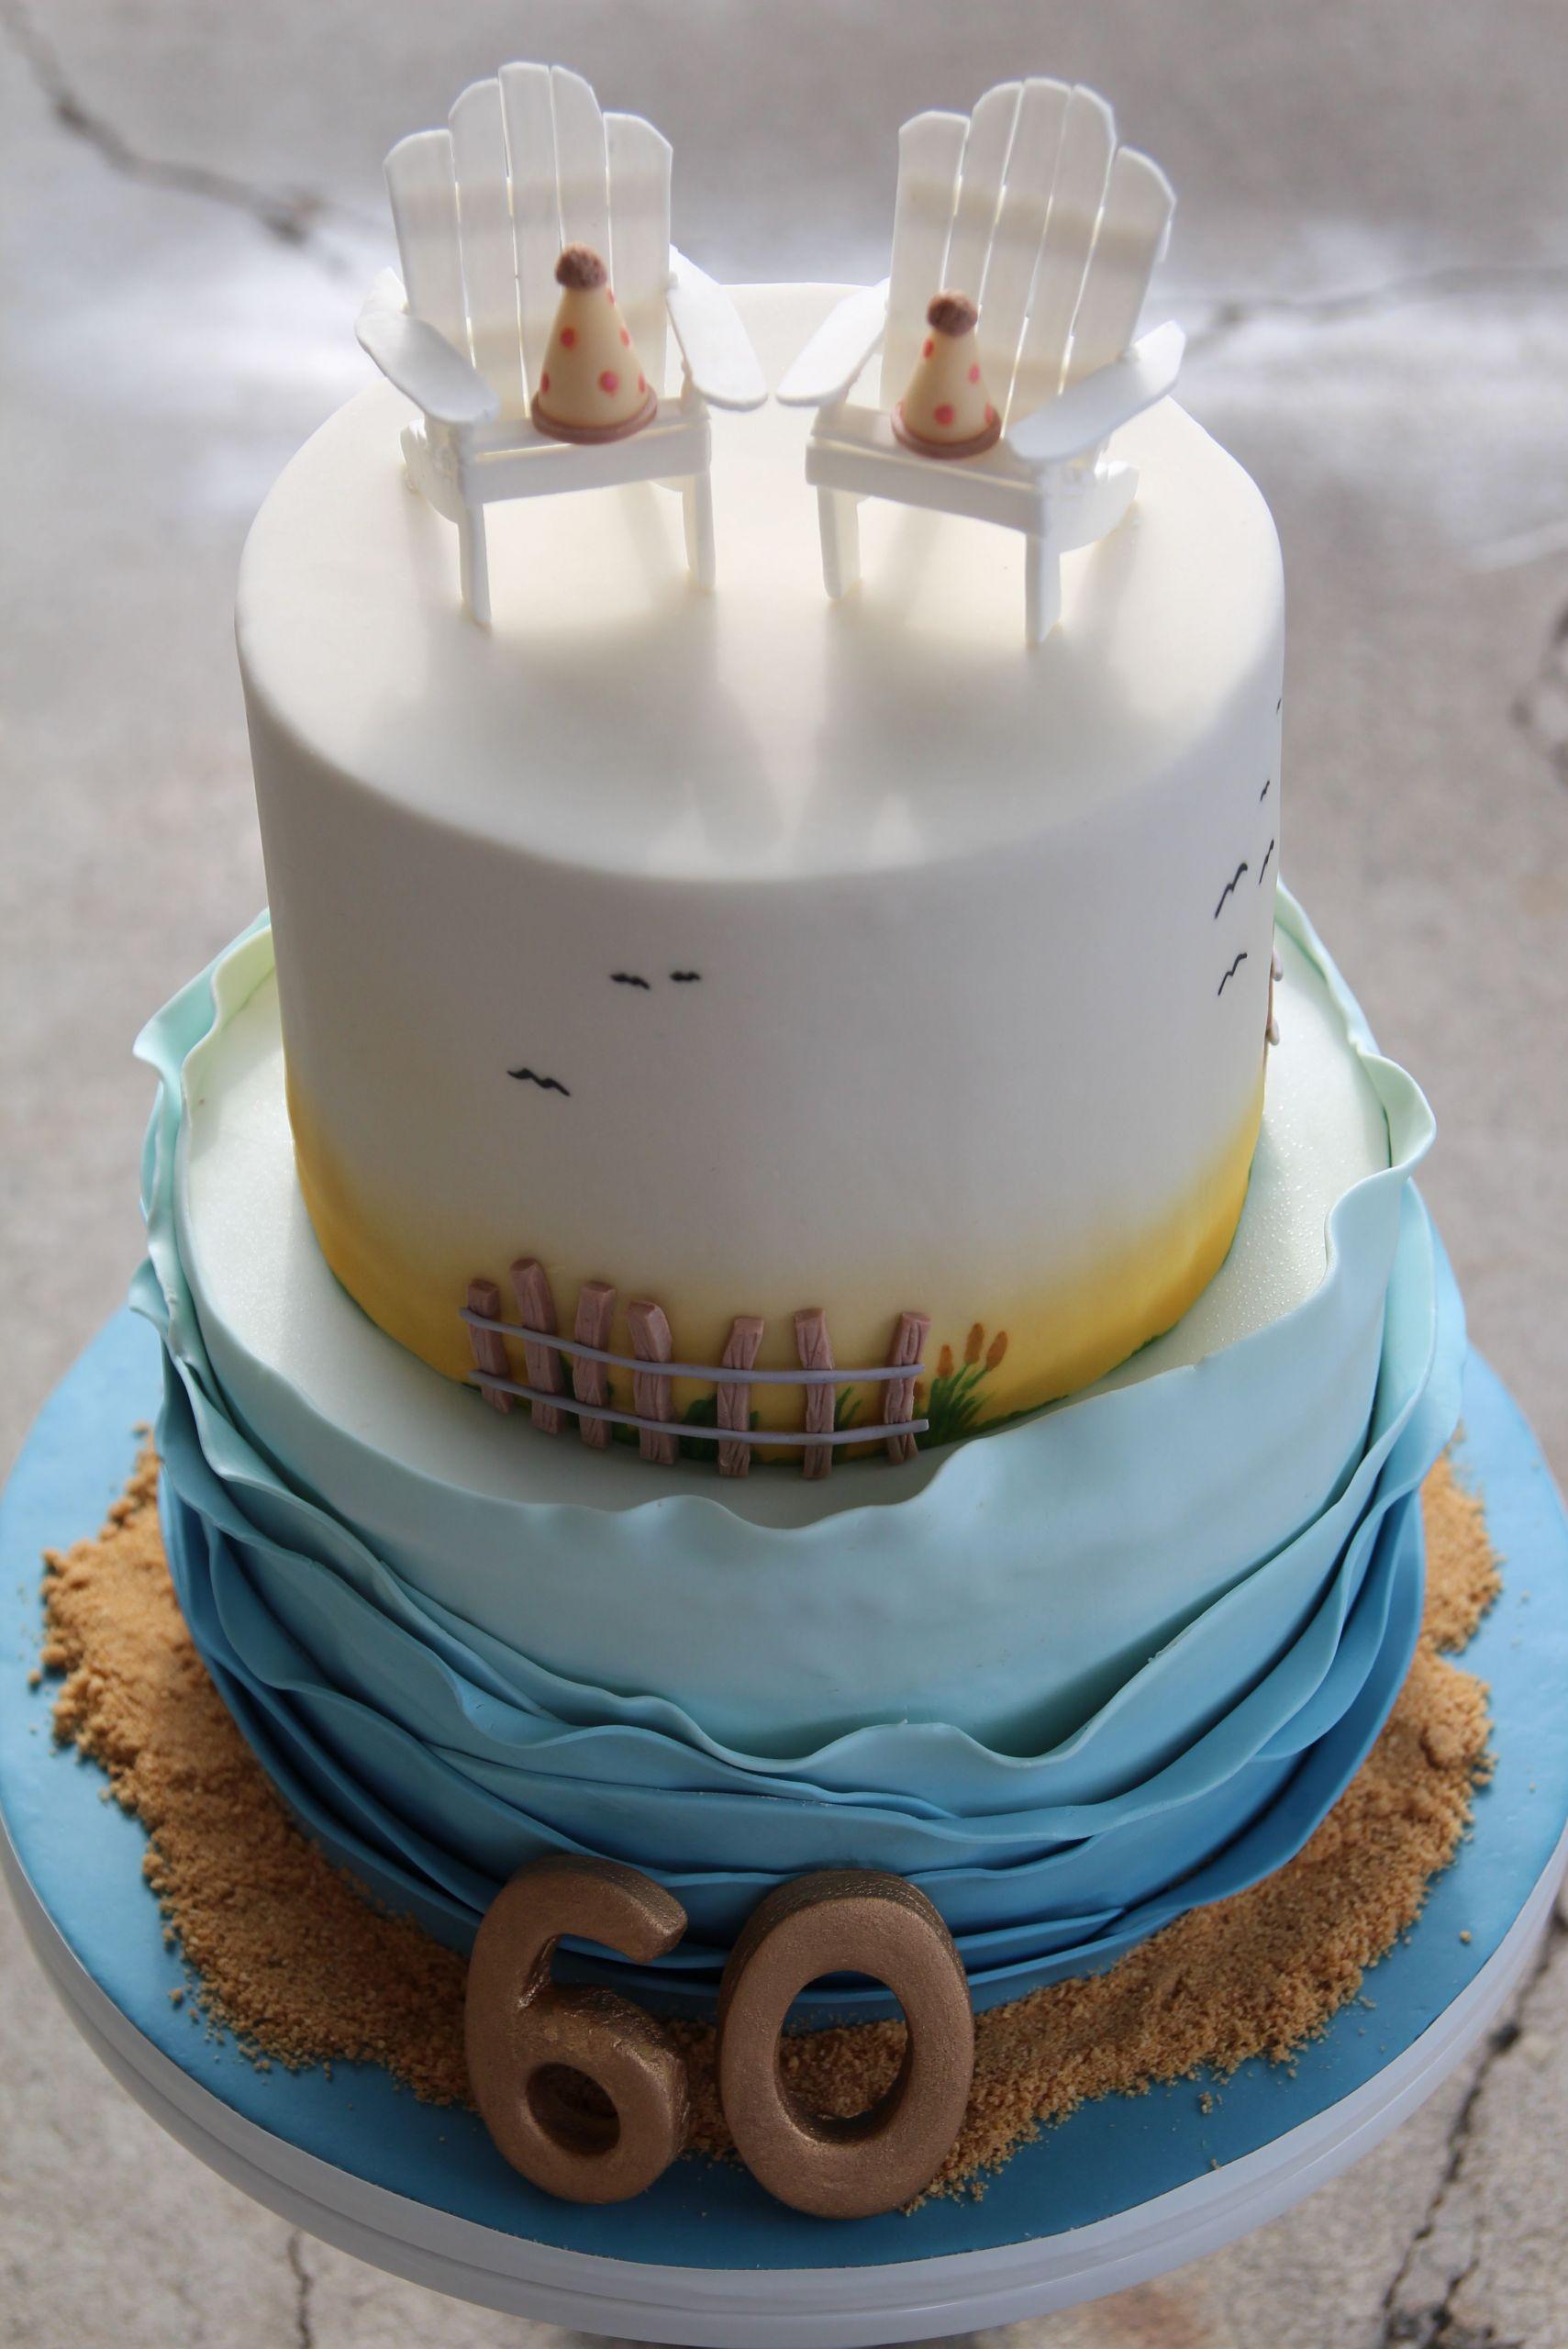 60th Birthday Cake Ideas  60th Birthday Cake